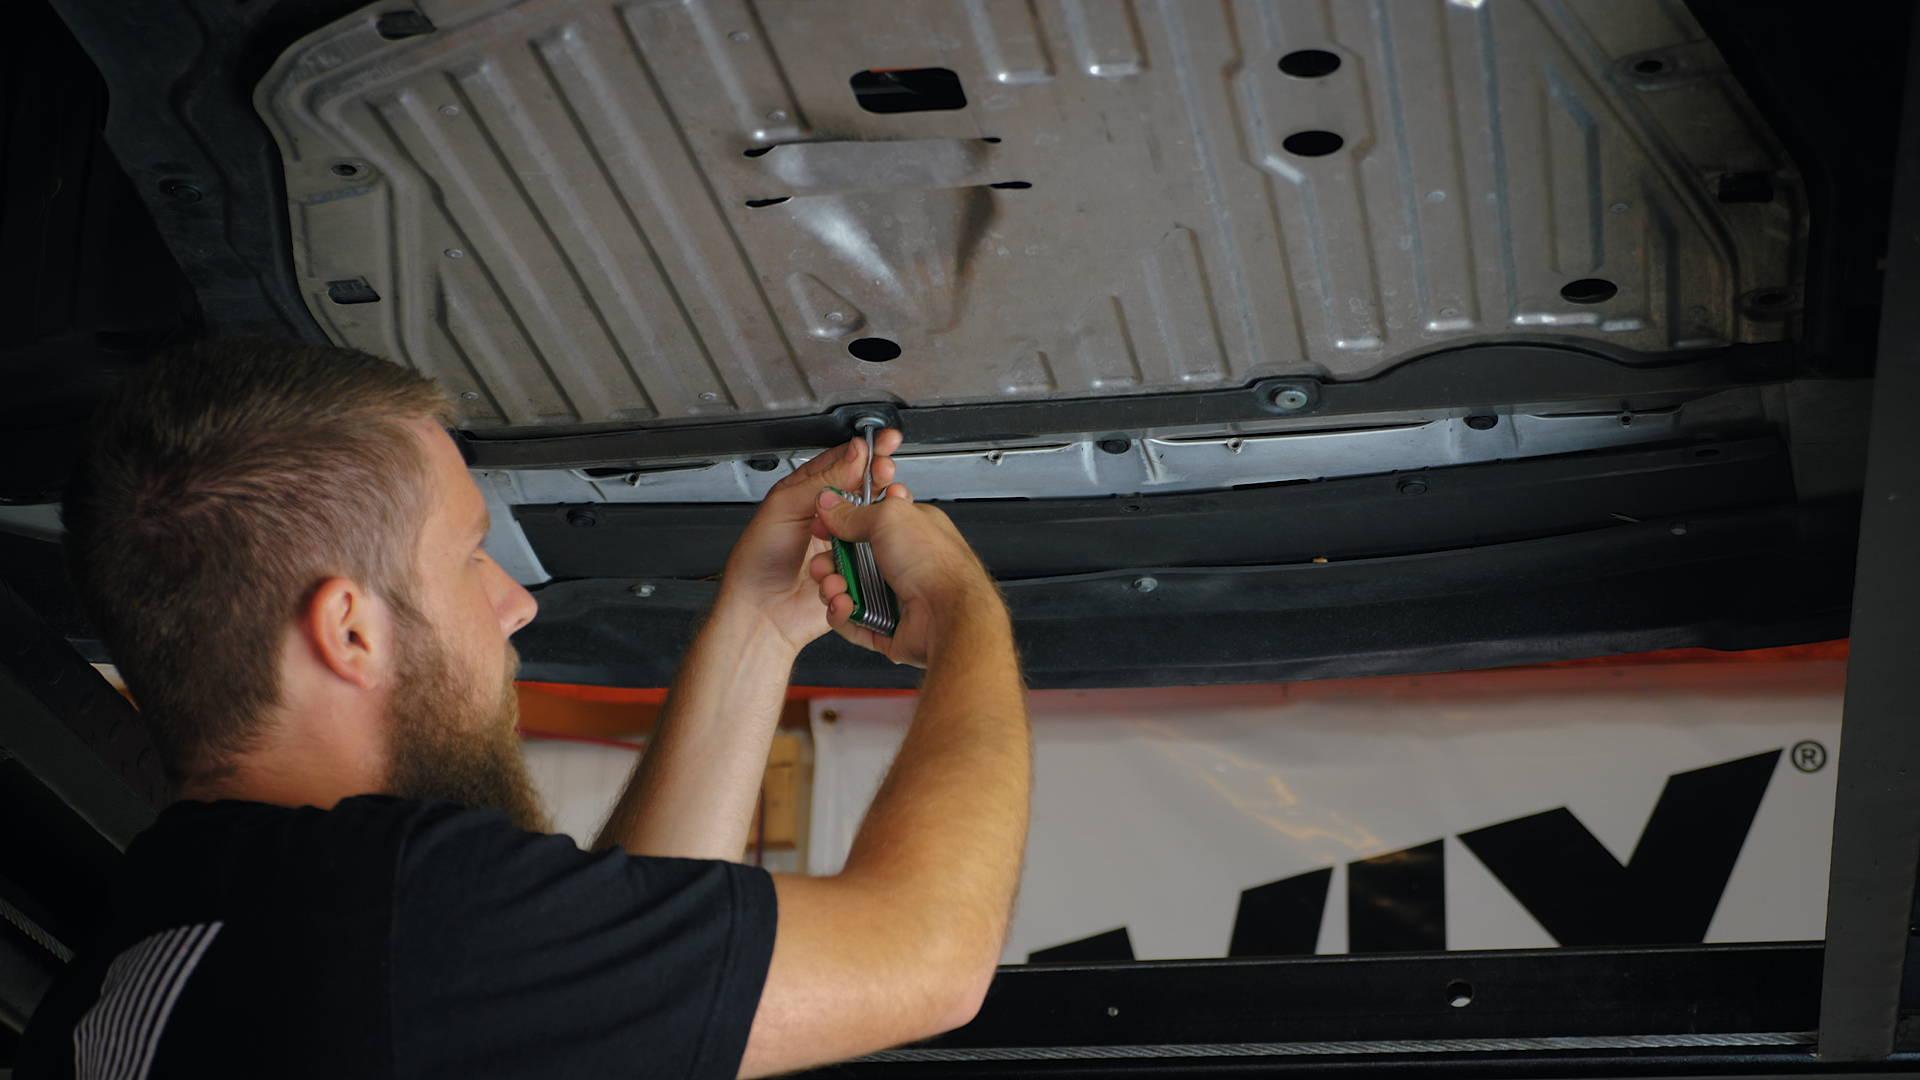 2017 Honda Civic - Using allen wrench on skid plate screws.